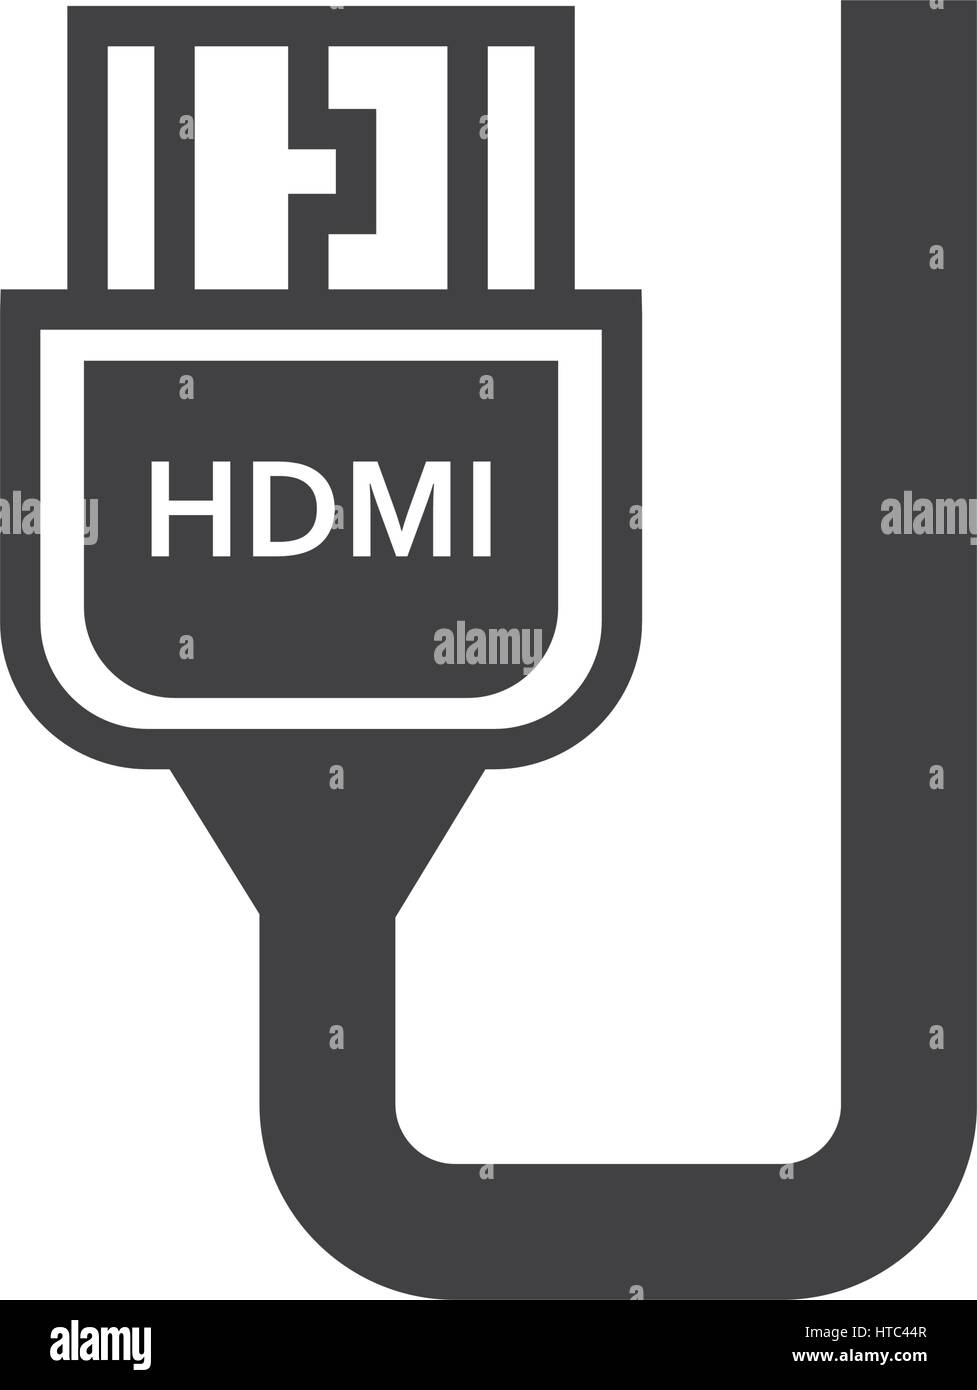 Großzügig Hdmi Draht Symbol Galerie - Der Schaltplan - greigo.com